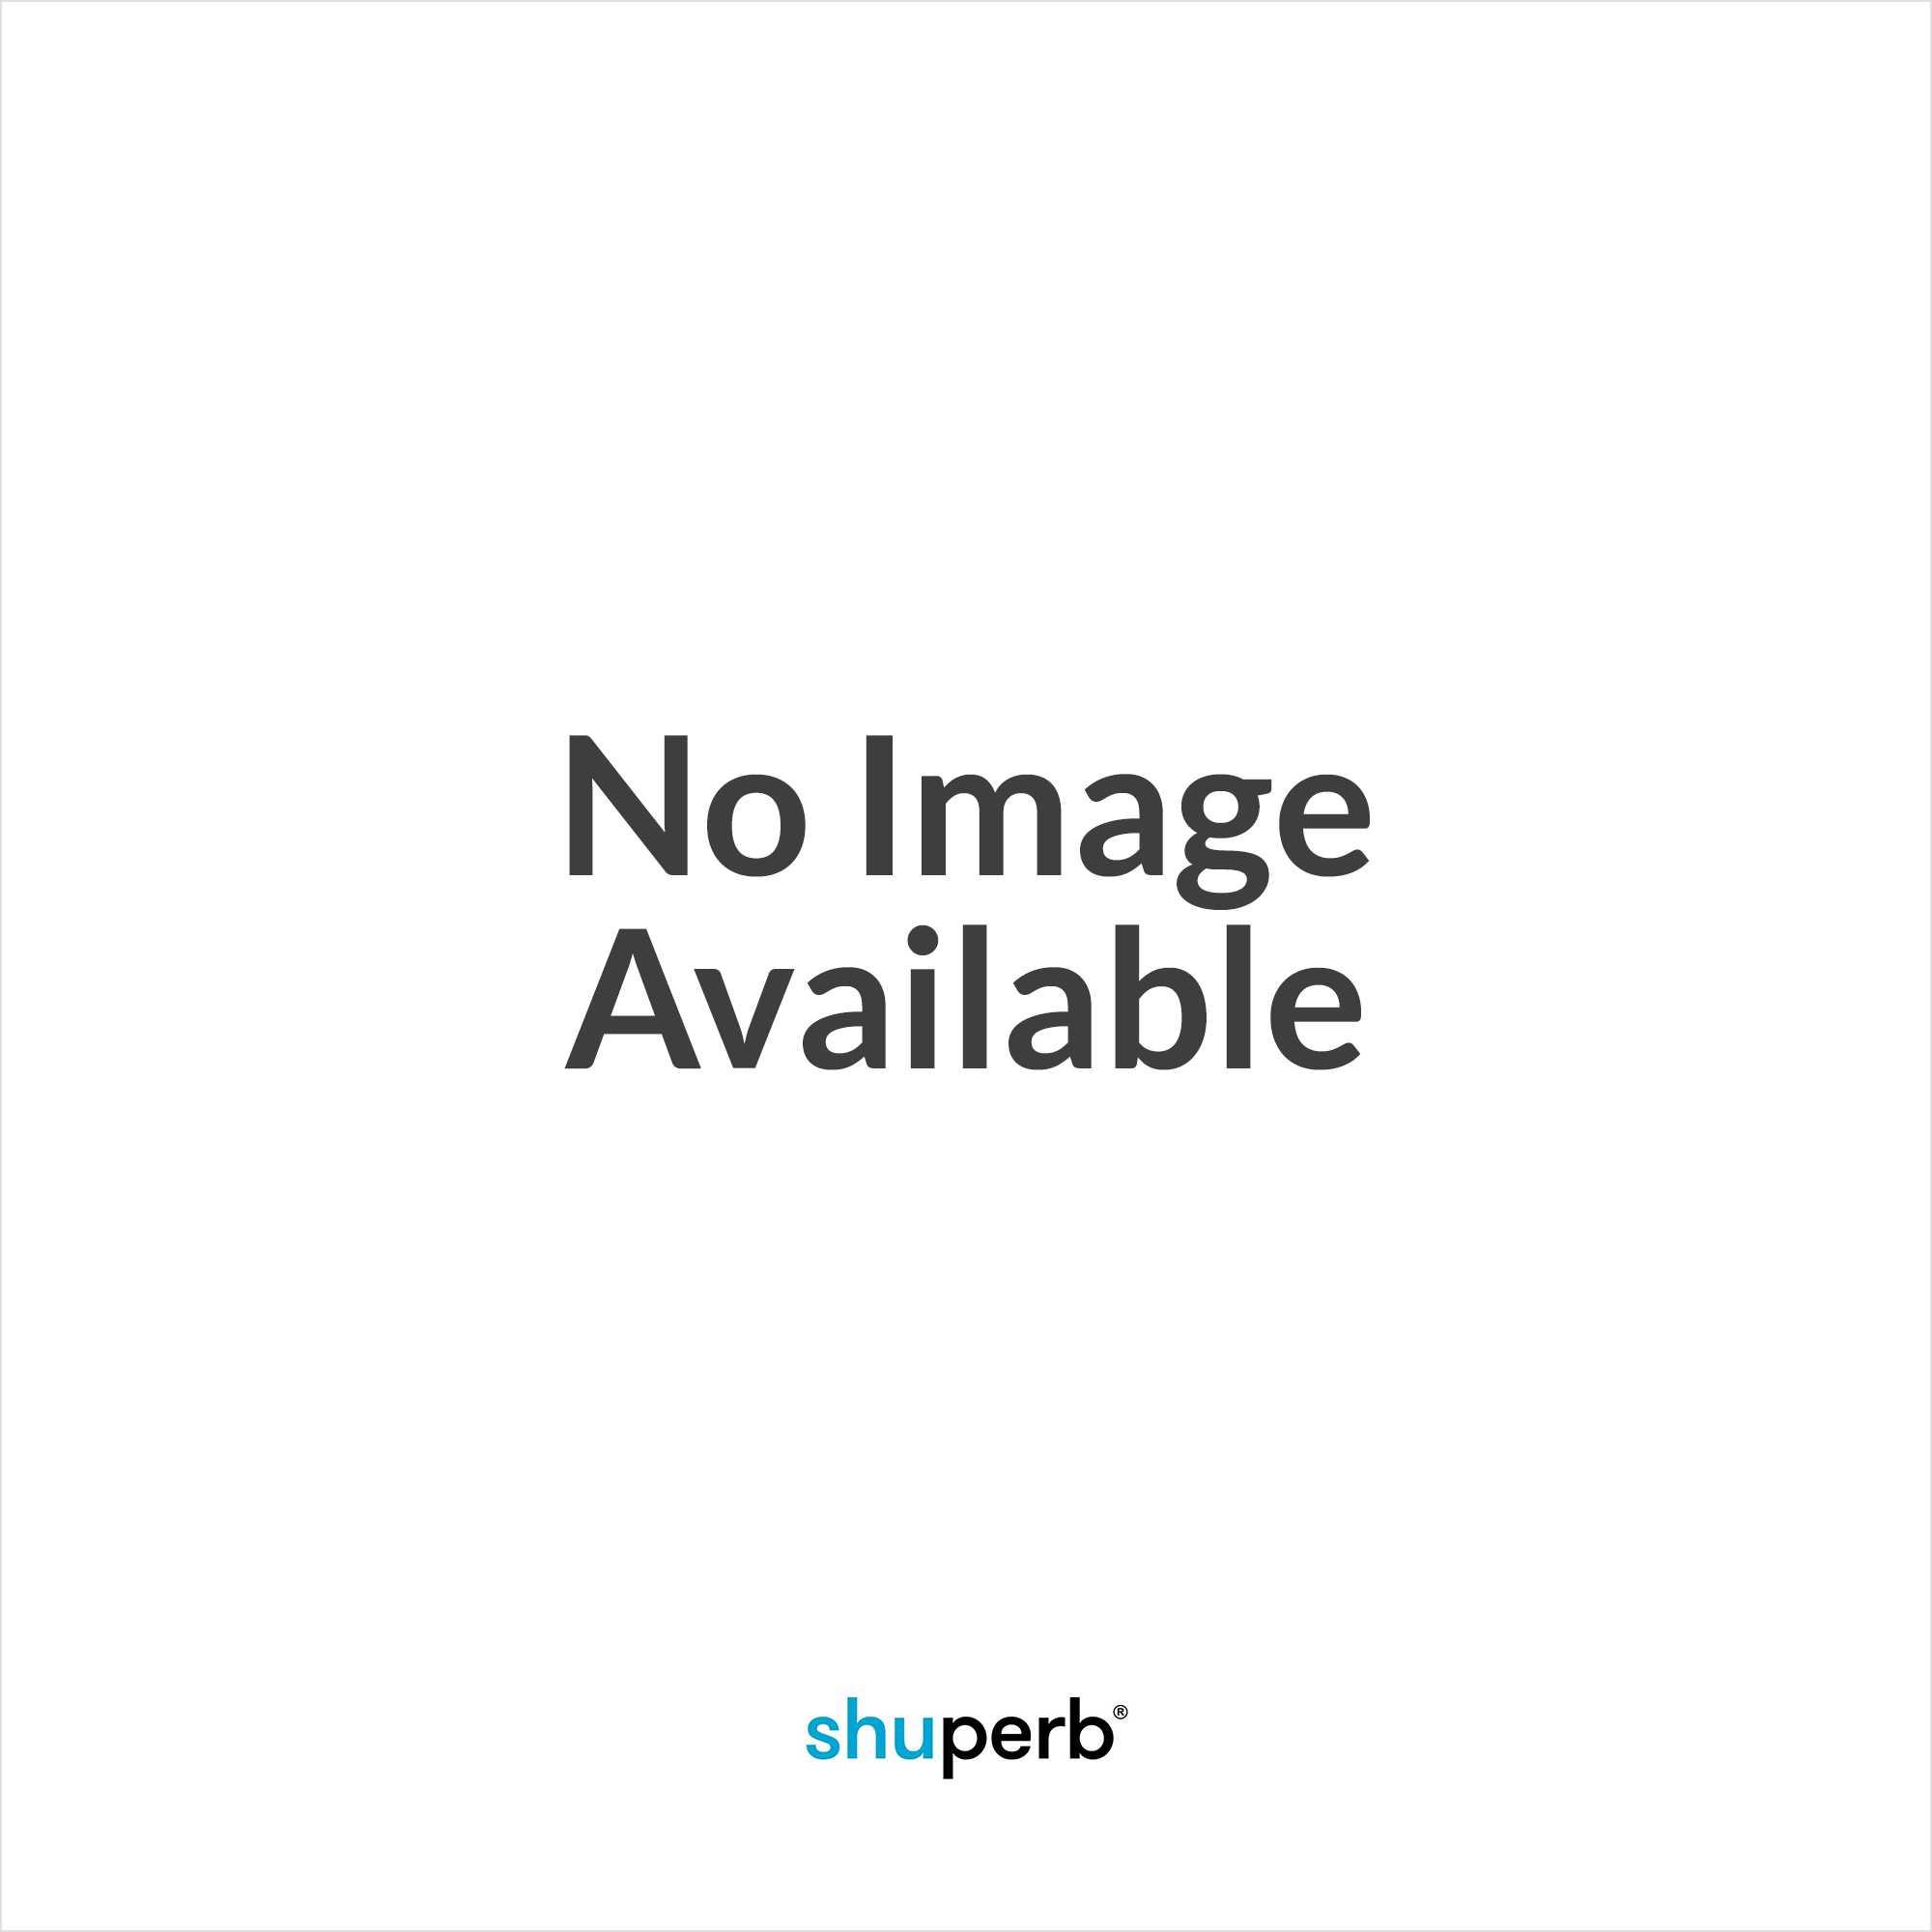 d17ad414acb8 Base London WOBURN Mens Leather Brogue Shoes Hi Shine Tan